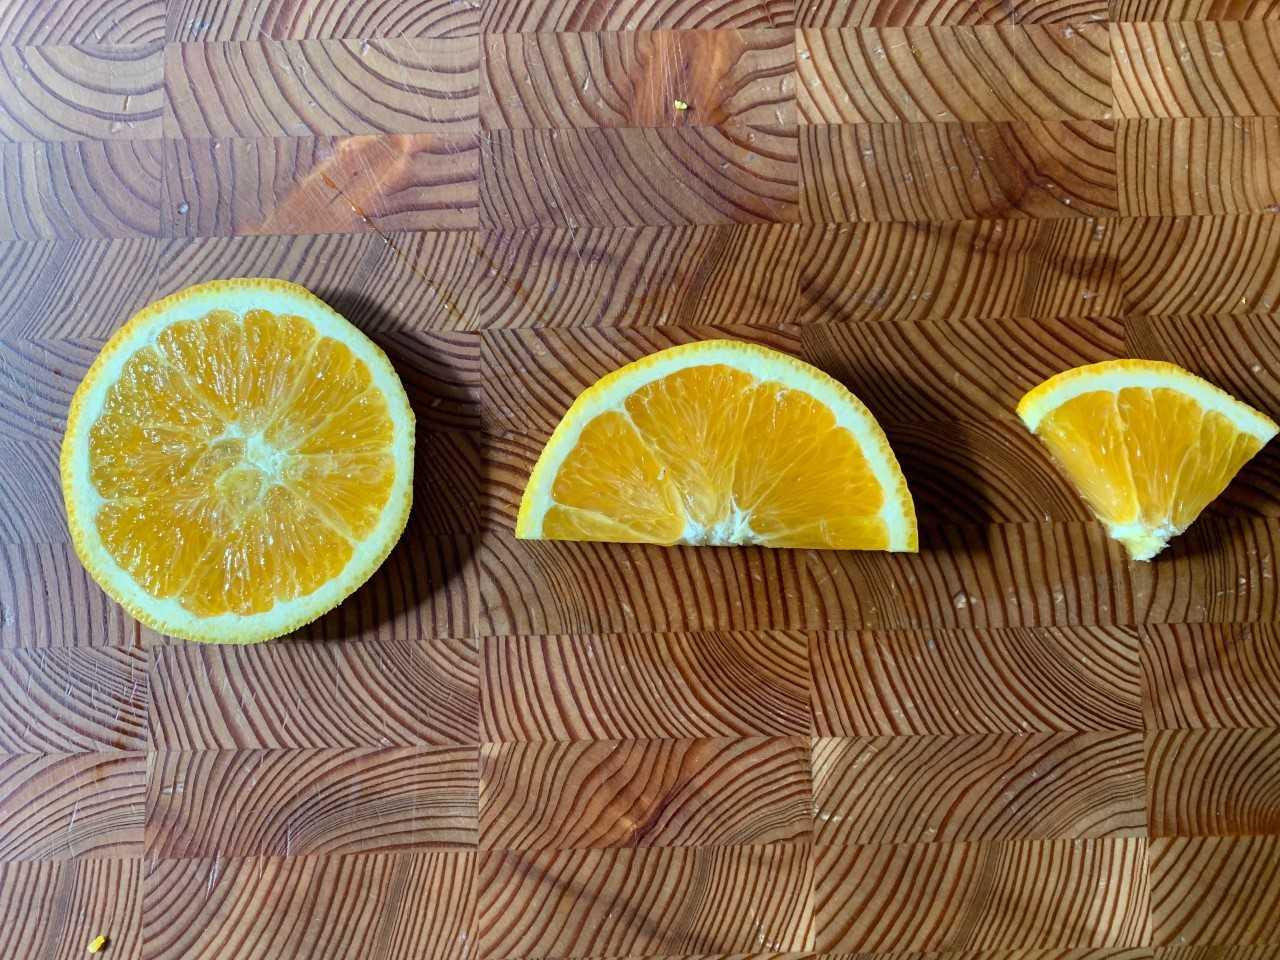 cut-orange-wedge